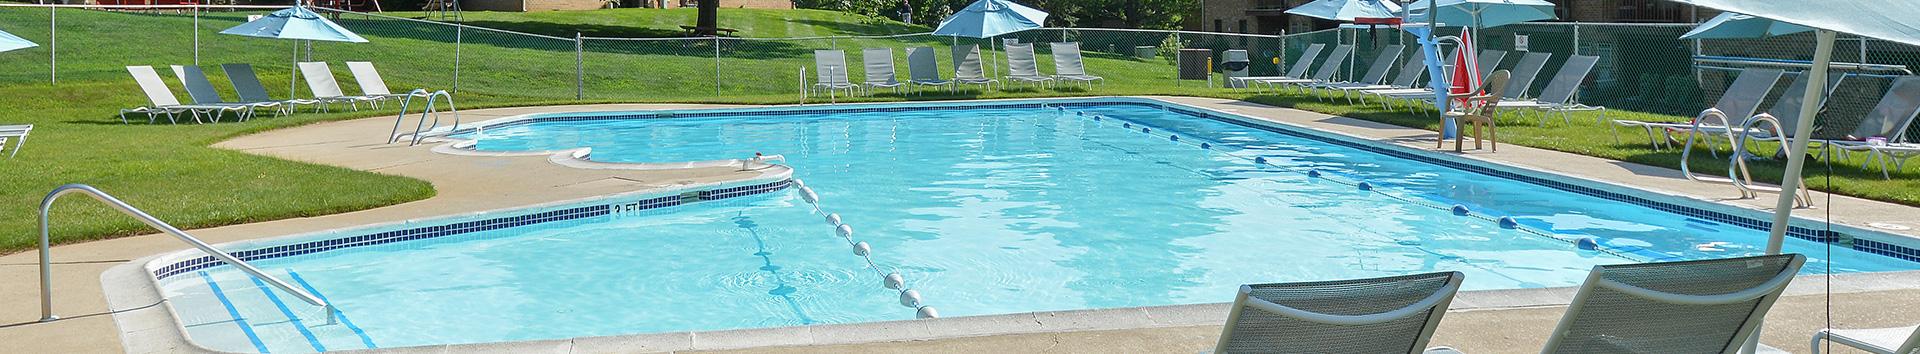 Swimming Pool of of Powder Mill Apartments at Manor Communities, York/Pennsylvania